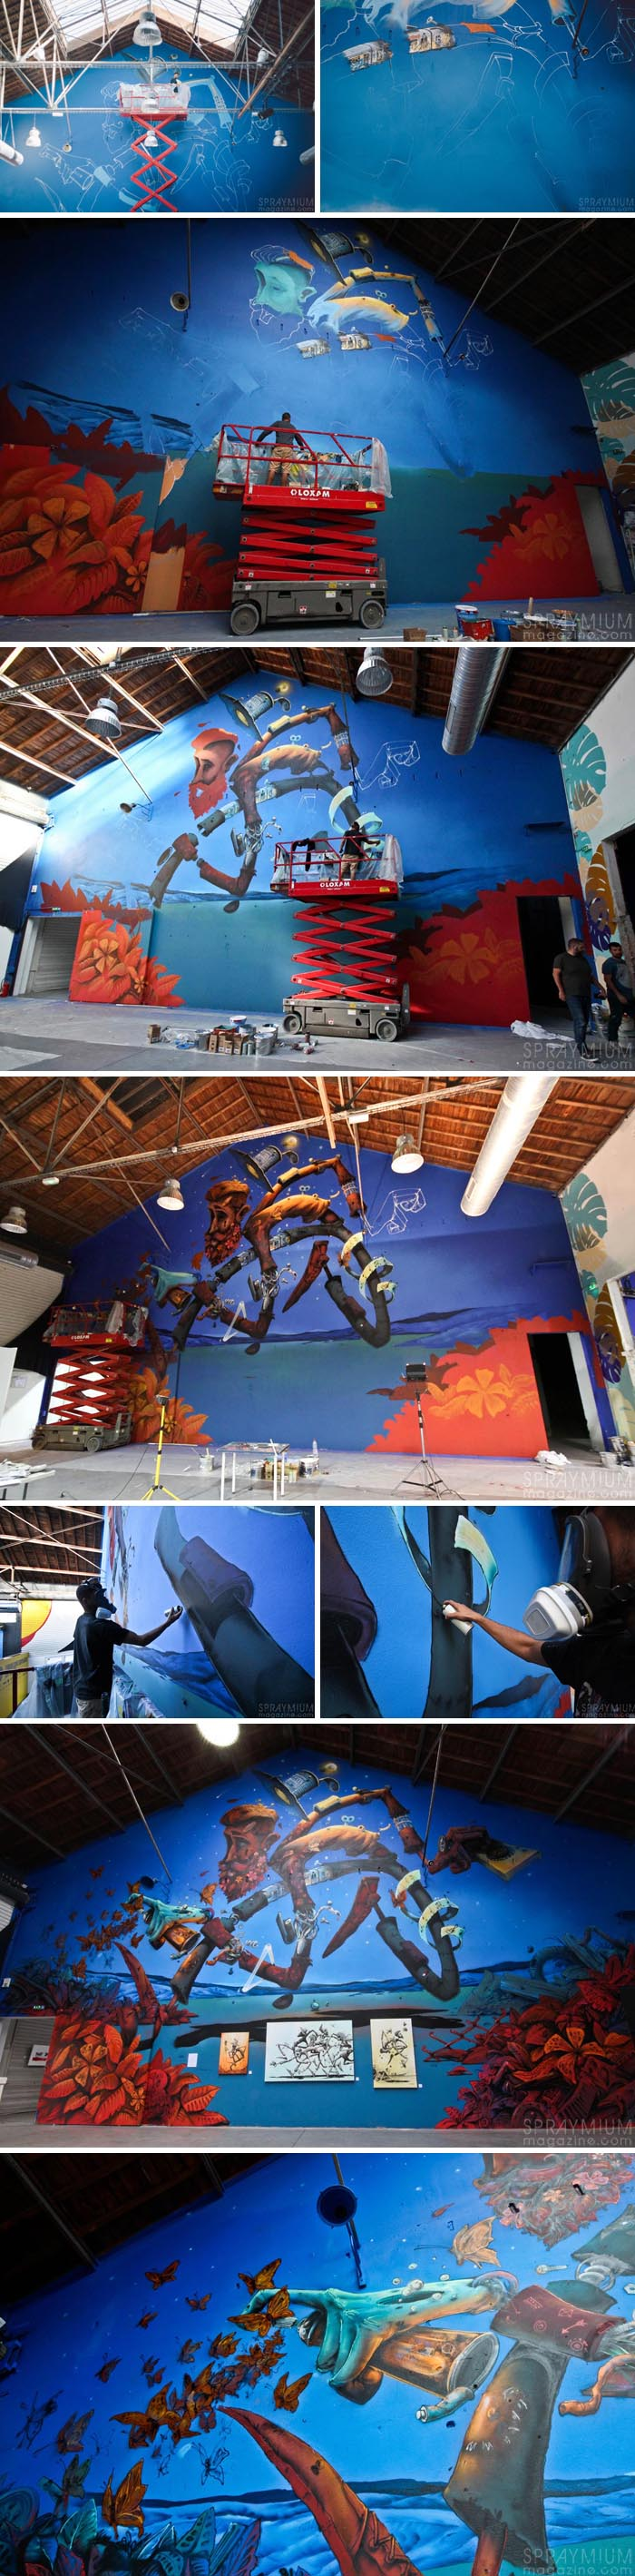 exposition mister freeze toulouse art urbain contemporain graffiti postgraffiti streetart muralism spraymium maye